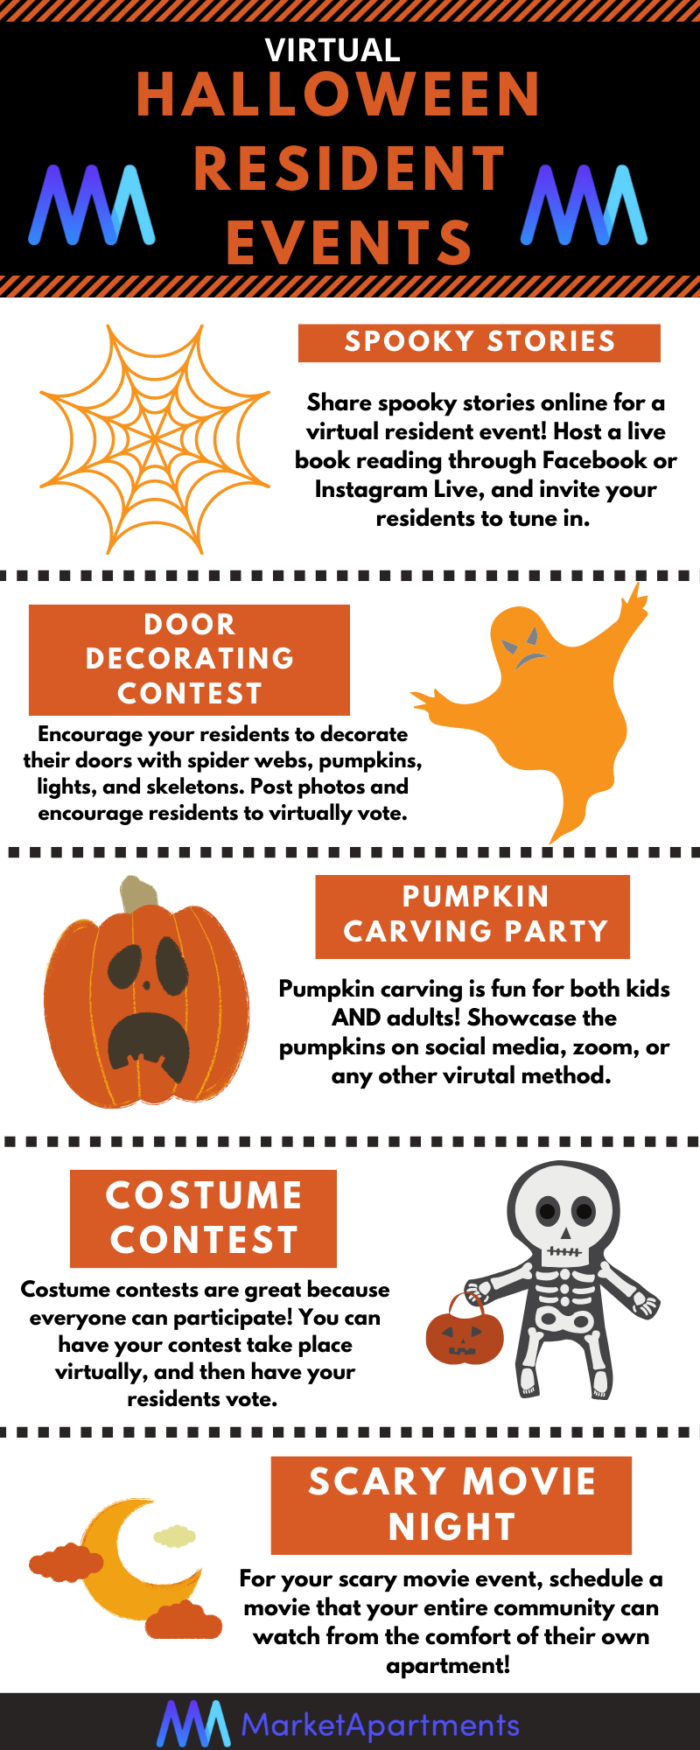 Halloween Virtual Resident Events